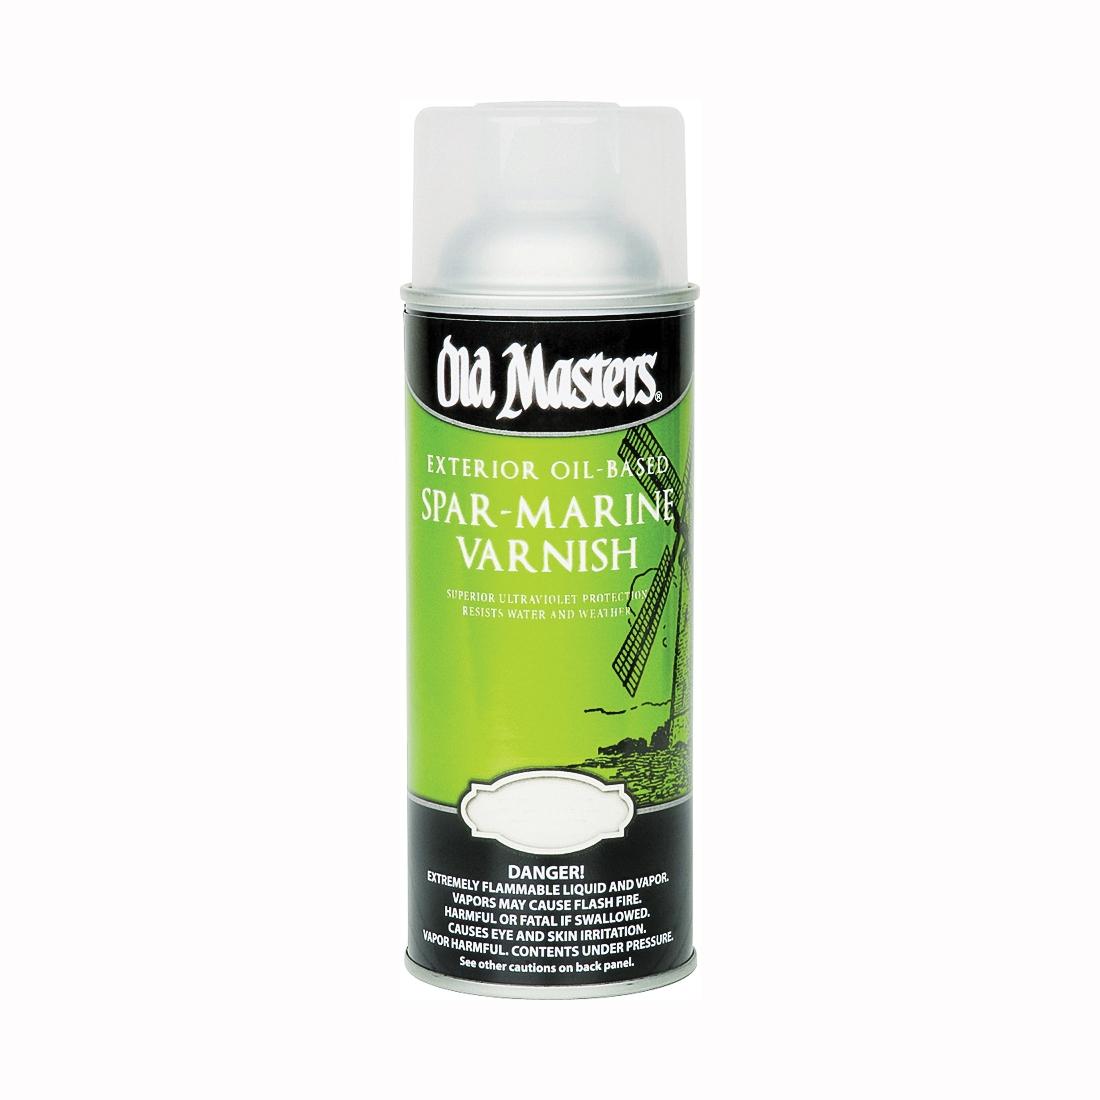 Picture of Old Masters 92510 Spar Marine Varnish, Semi-Gloss, Liquid, 13 oz, Aerosol Can